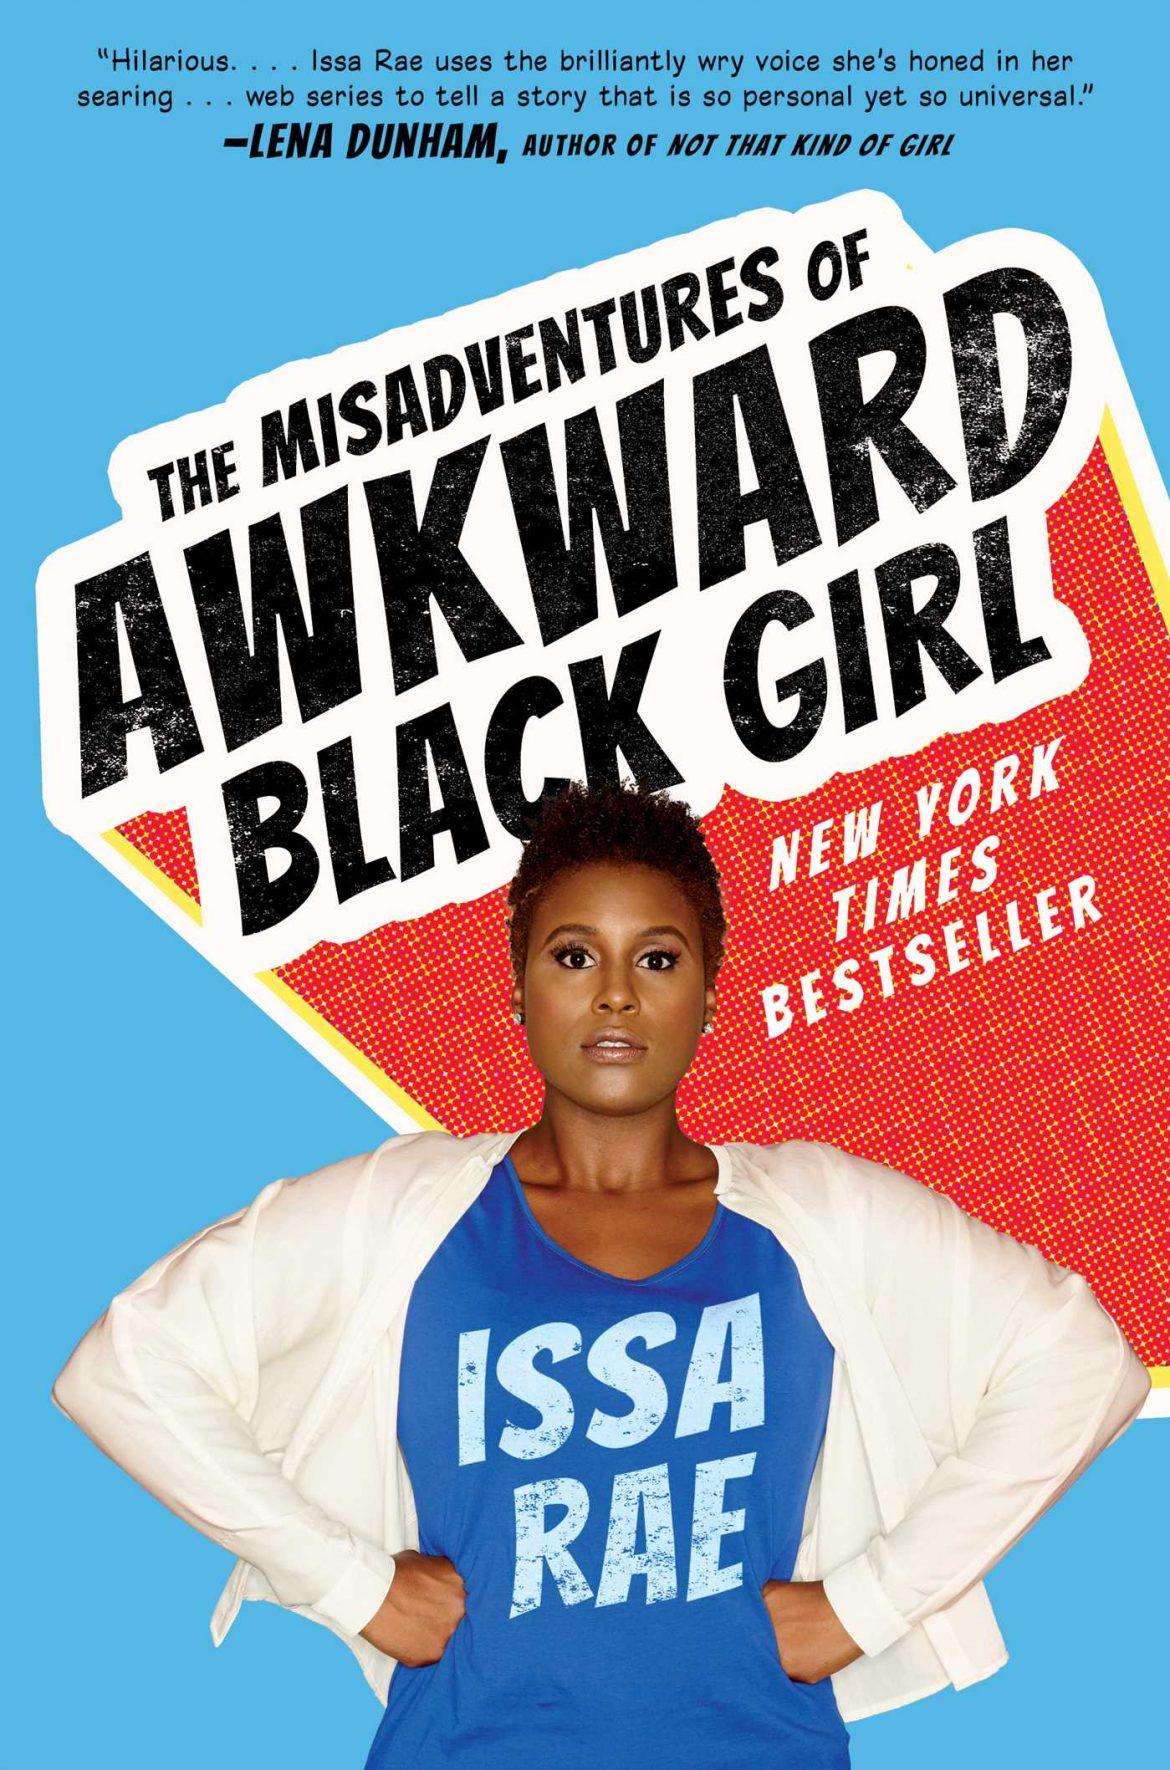 The-Misadventures-of-Awkward-Black-Girl